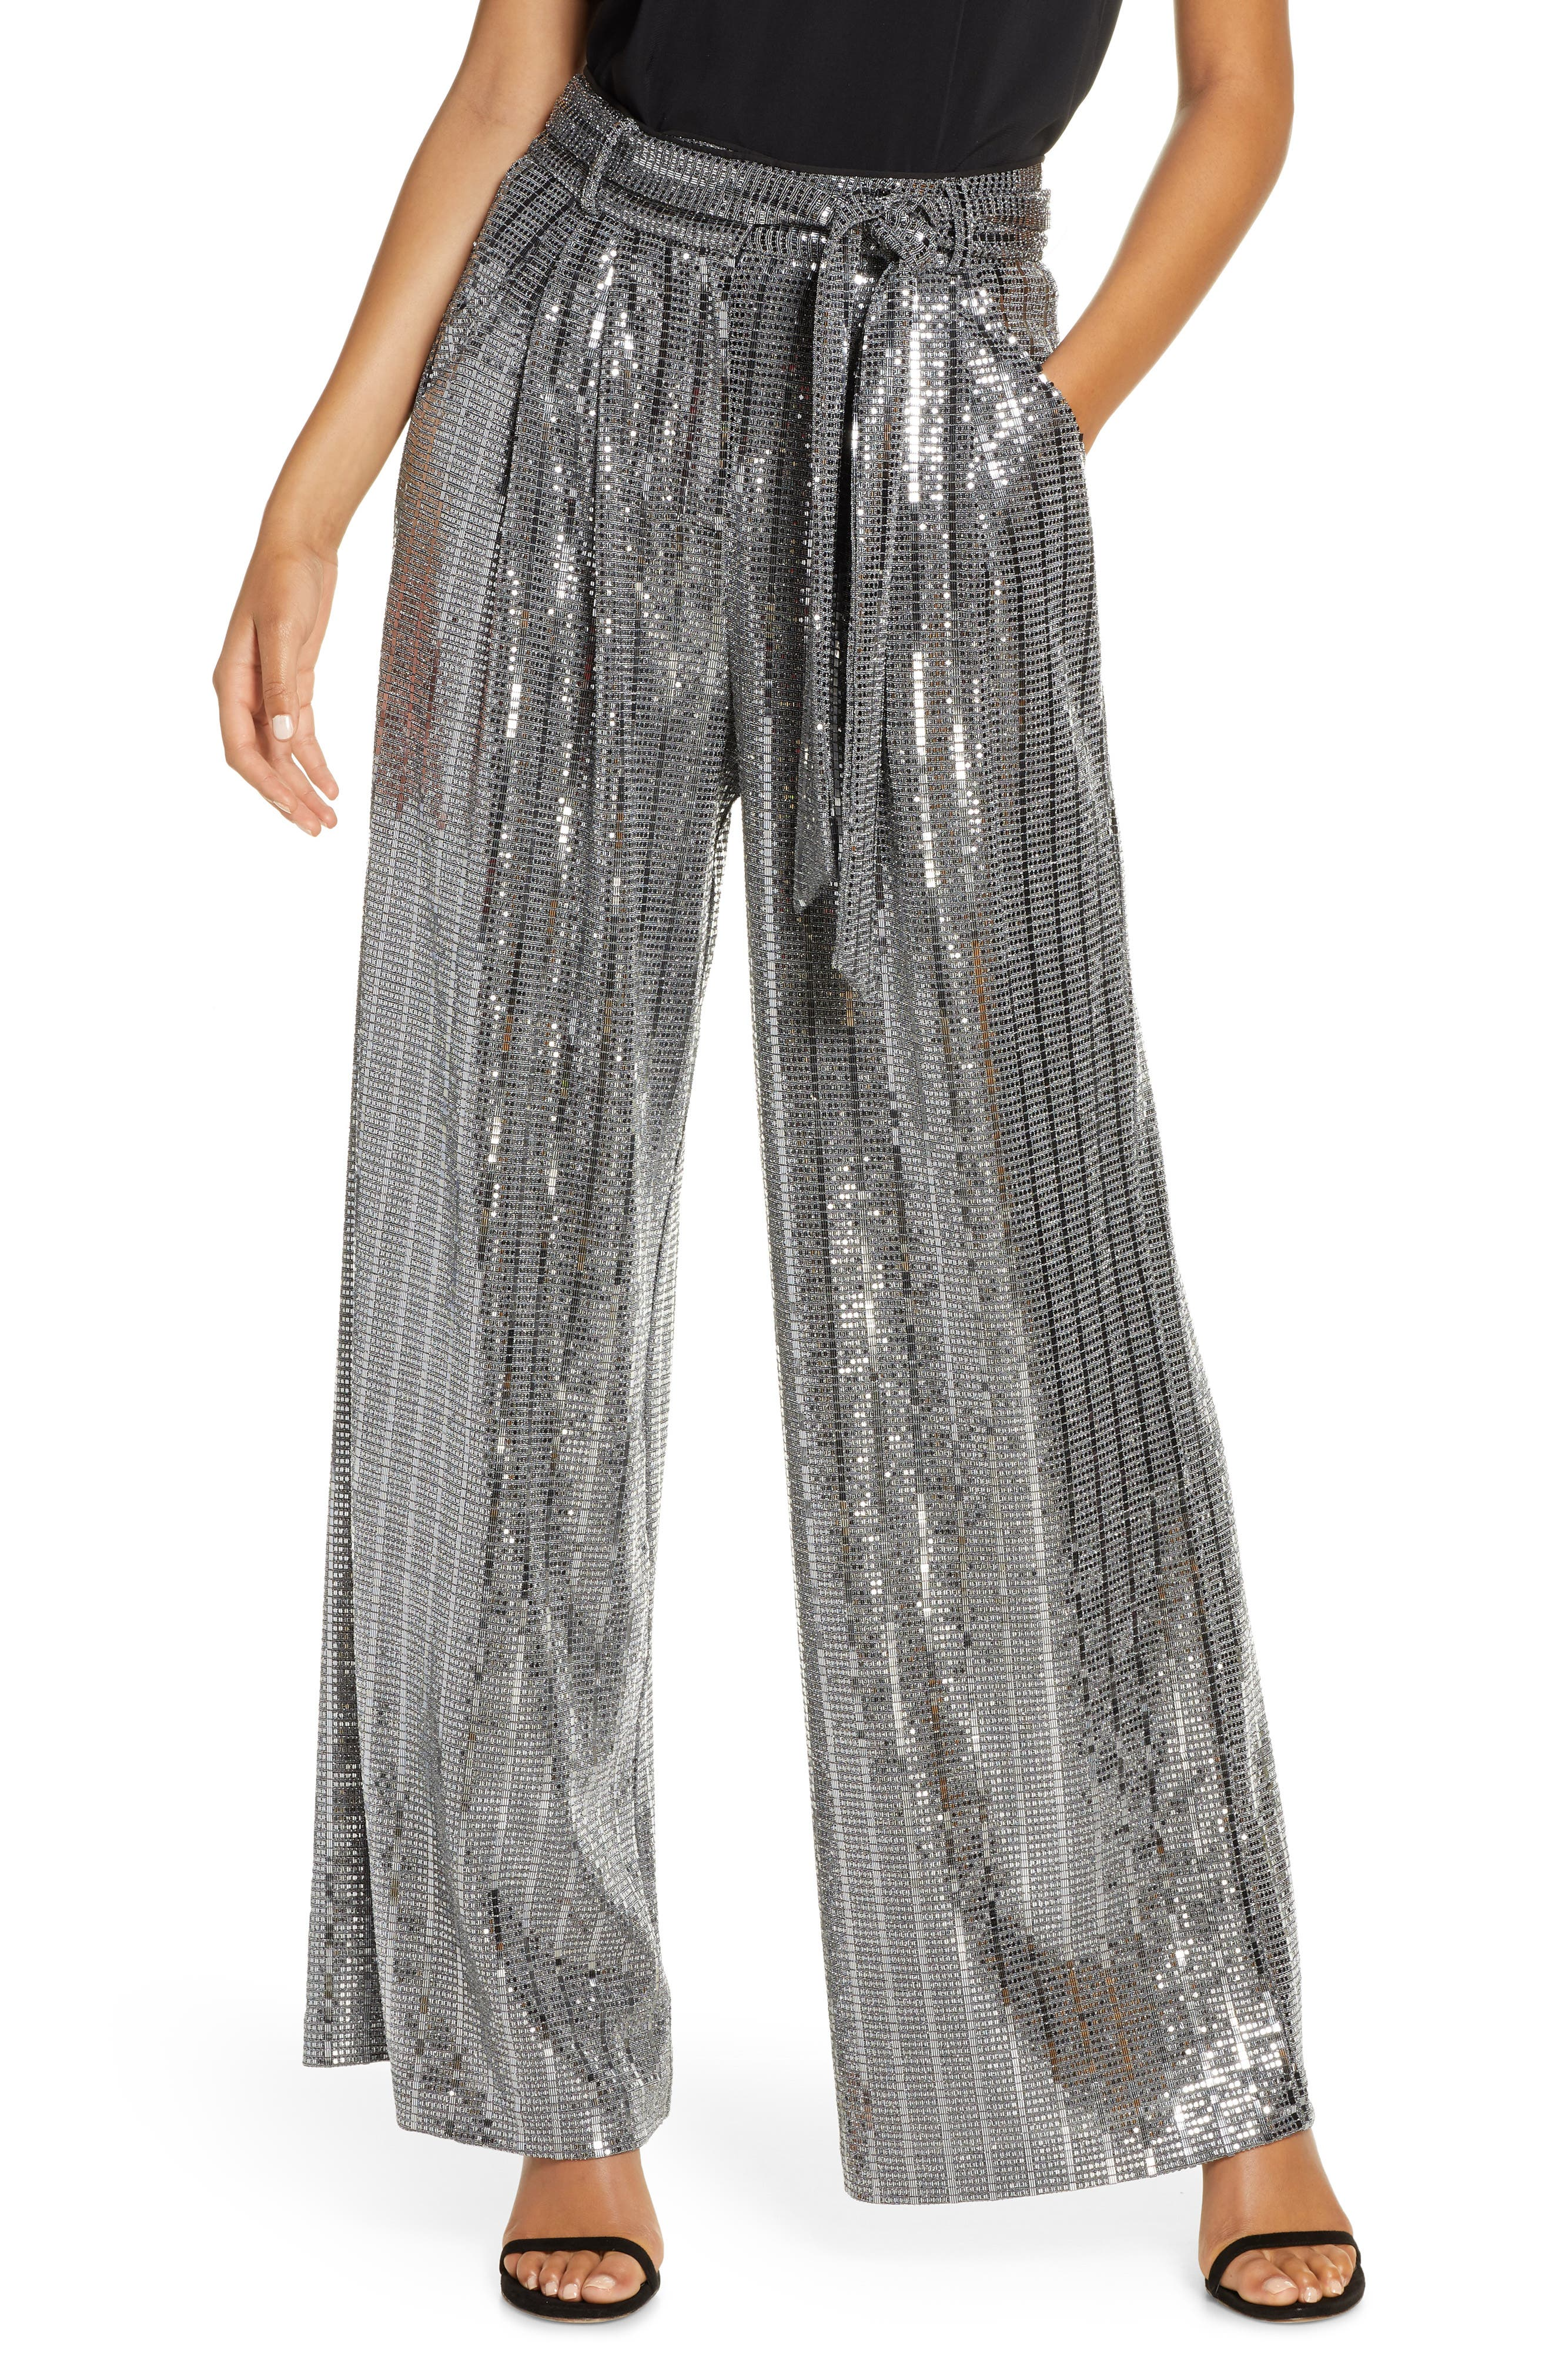 Vintage High Waisted Trousers, Sailor Pants, Jeans Womens Eliza J Wide Leg Sequin Pants $112.80 AT vintagedancer.com